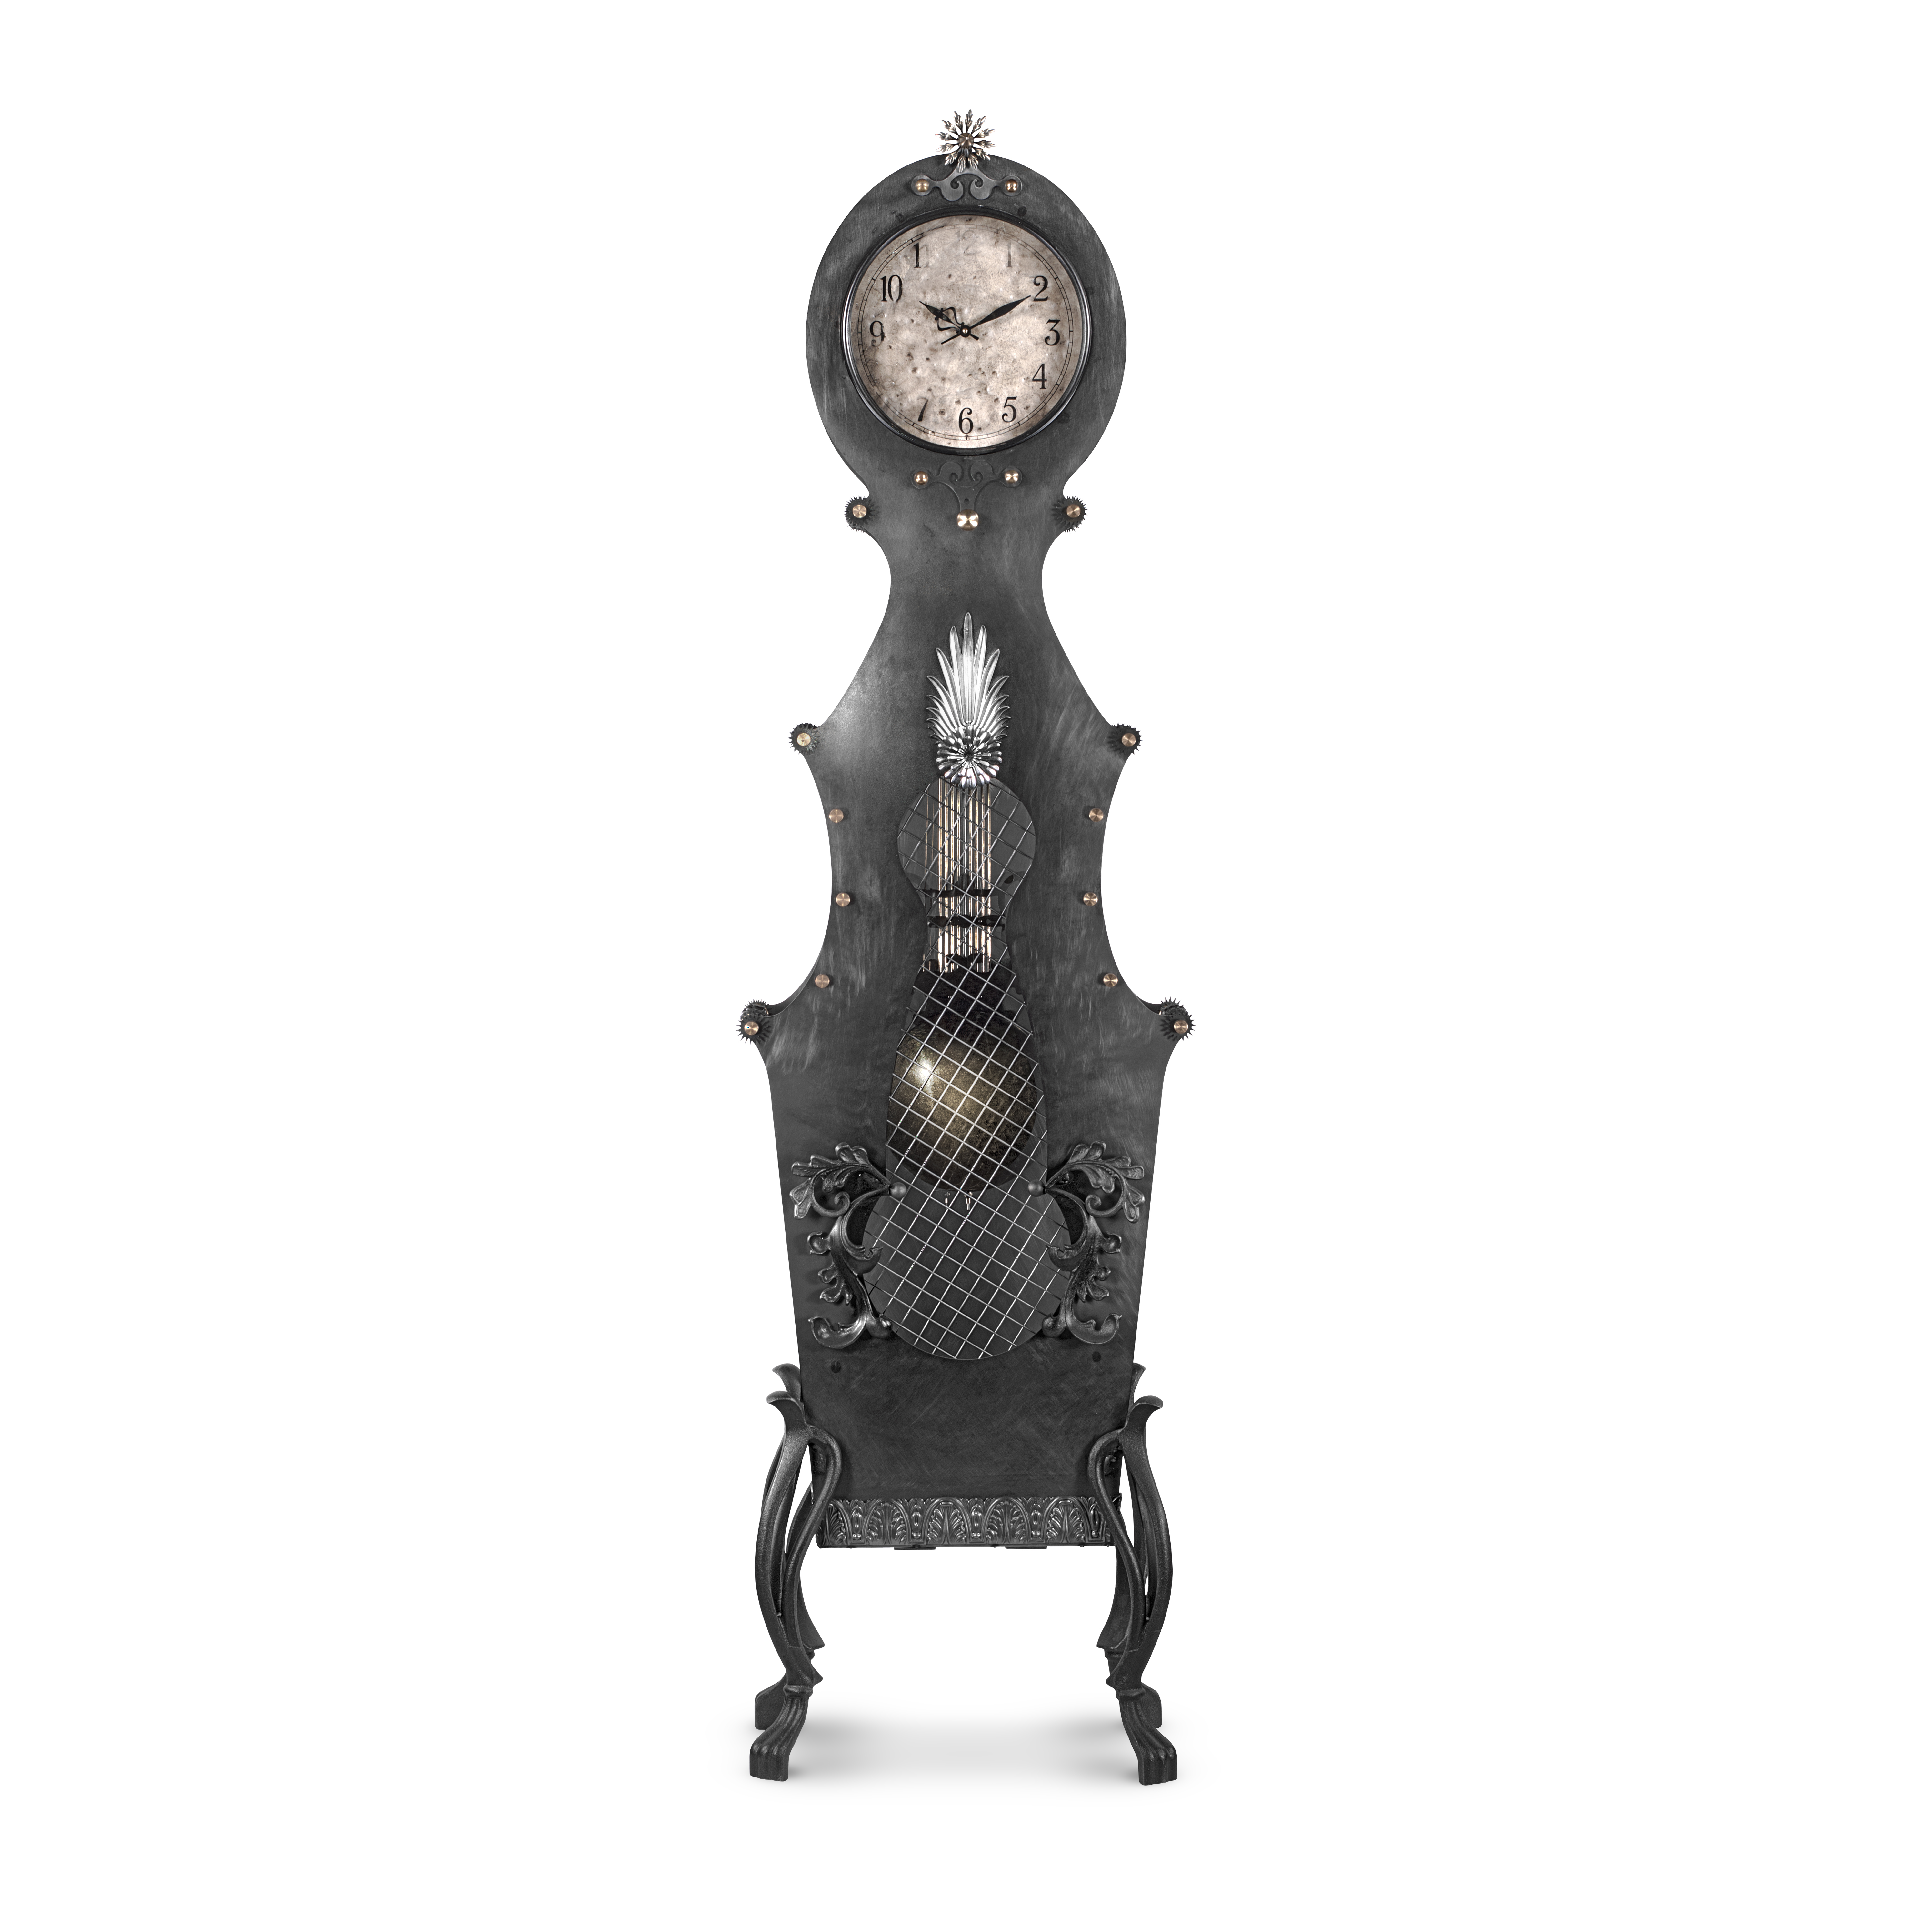 Didier Clock